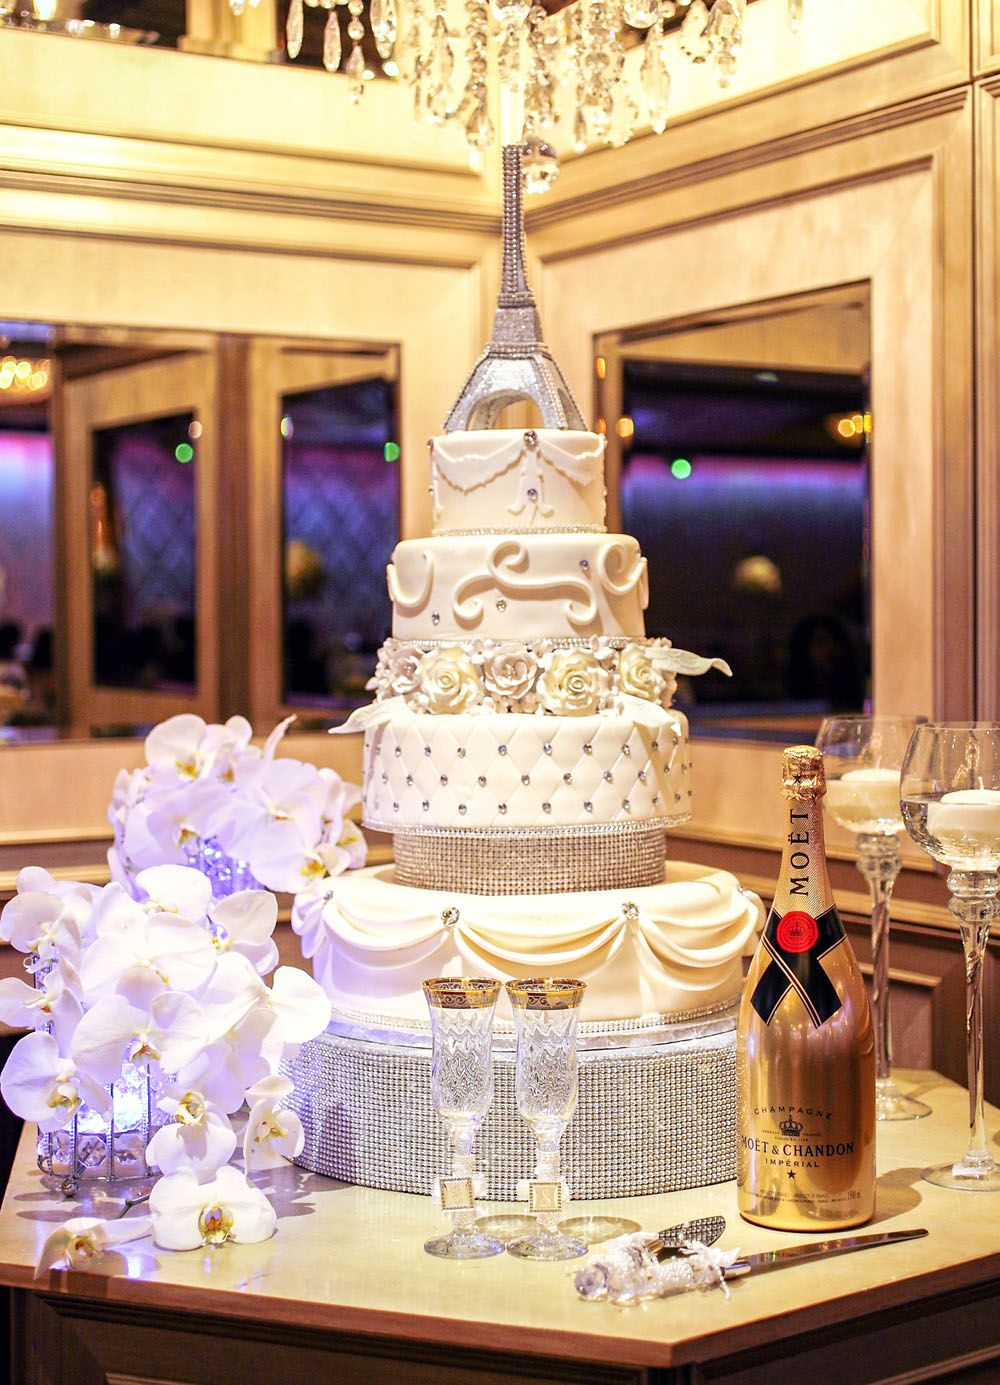 Big Wedding Cake Prices Simple Wedding Cakes Big Wedding Cakes Glamorous Wedding Cakes Simple Wedding Cake